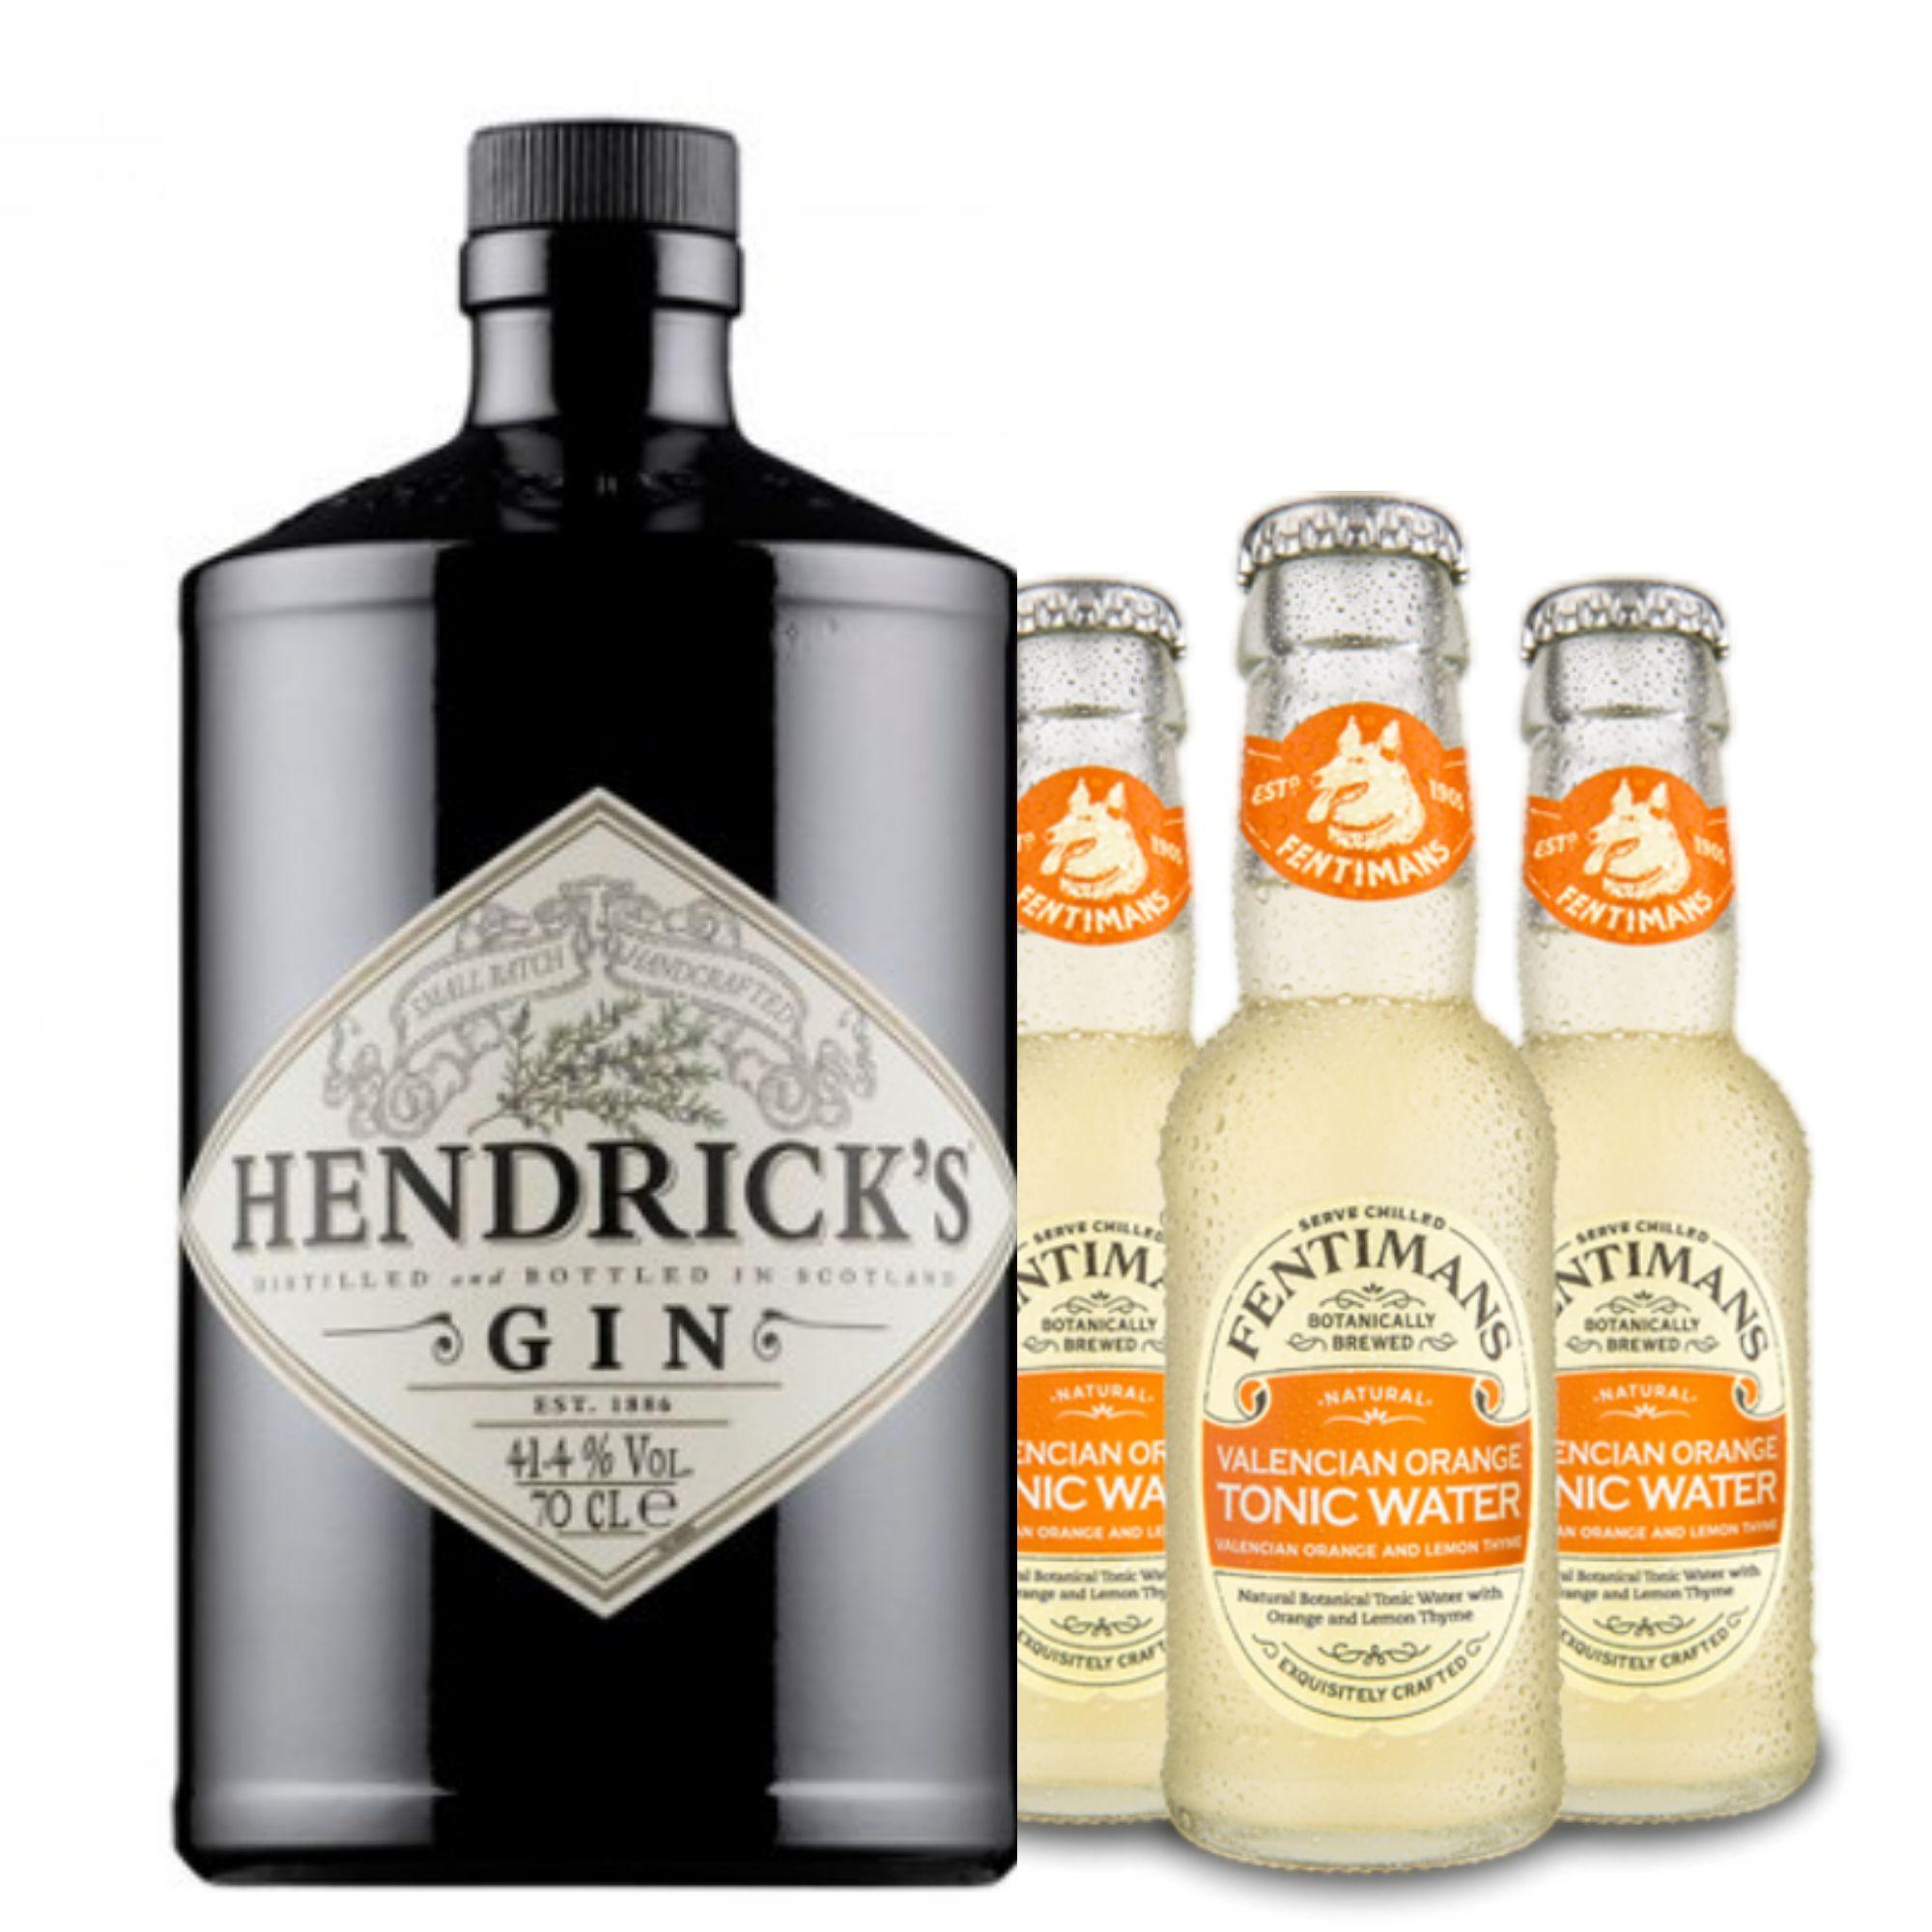 Pack Hendricks com 3 Fentimans Orange